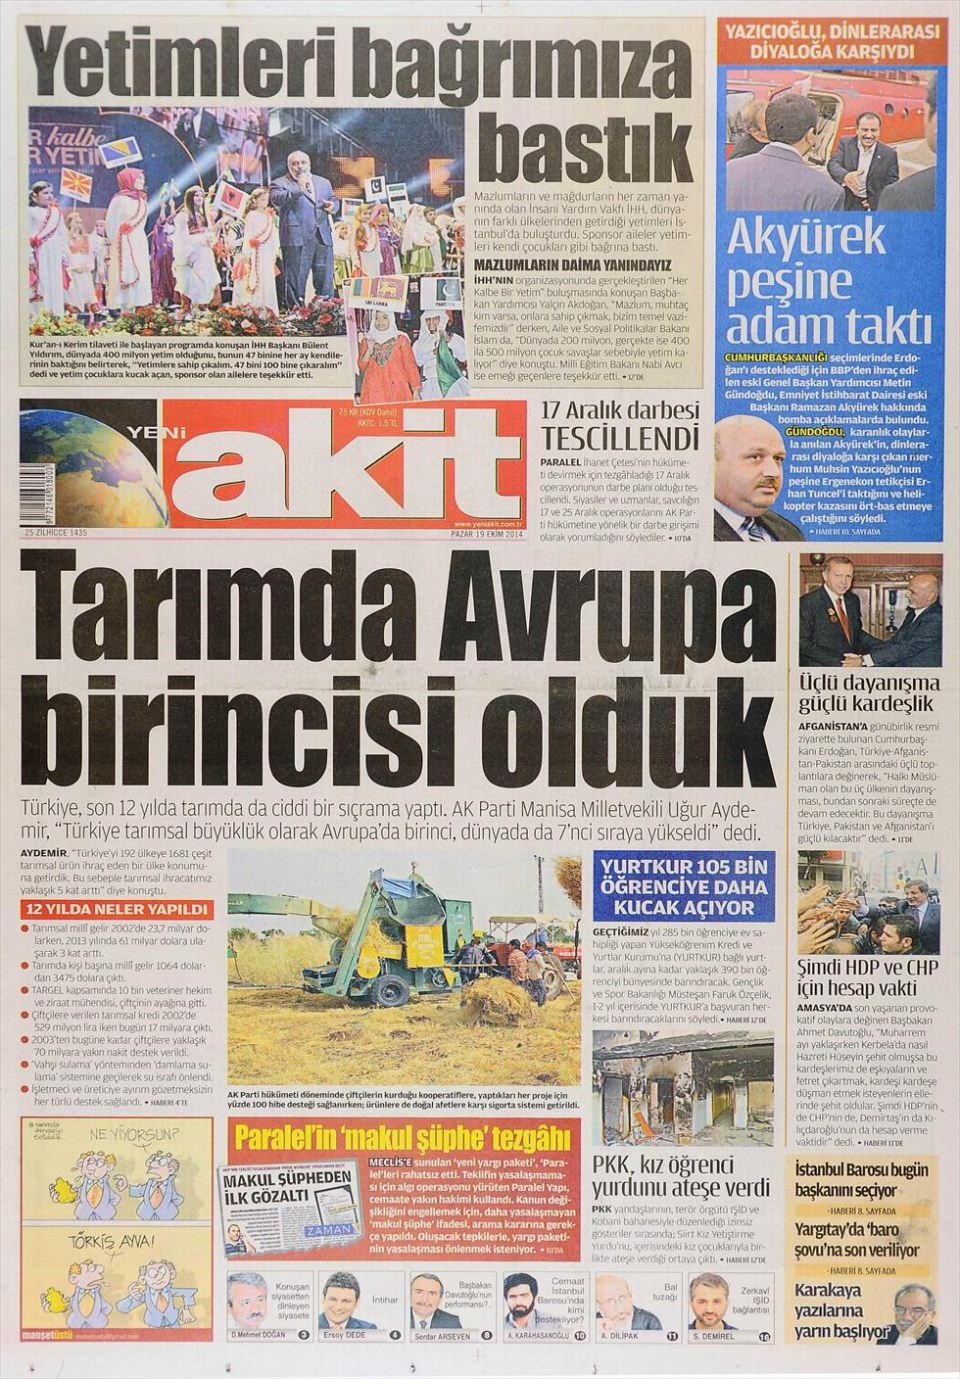 20 Ekim 2014 gazete manşetleri 22